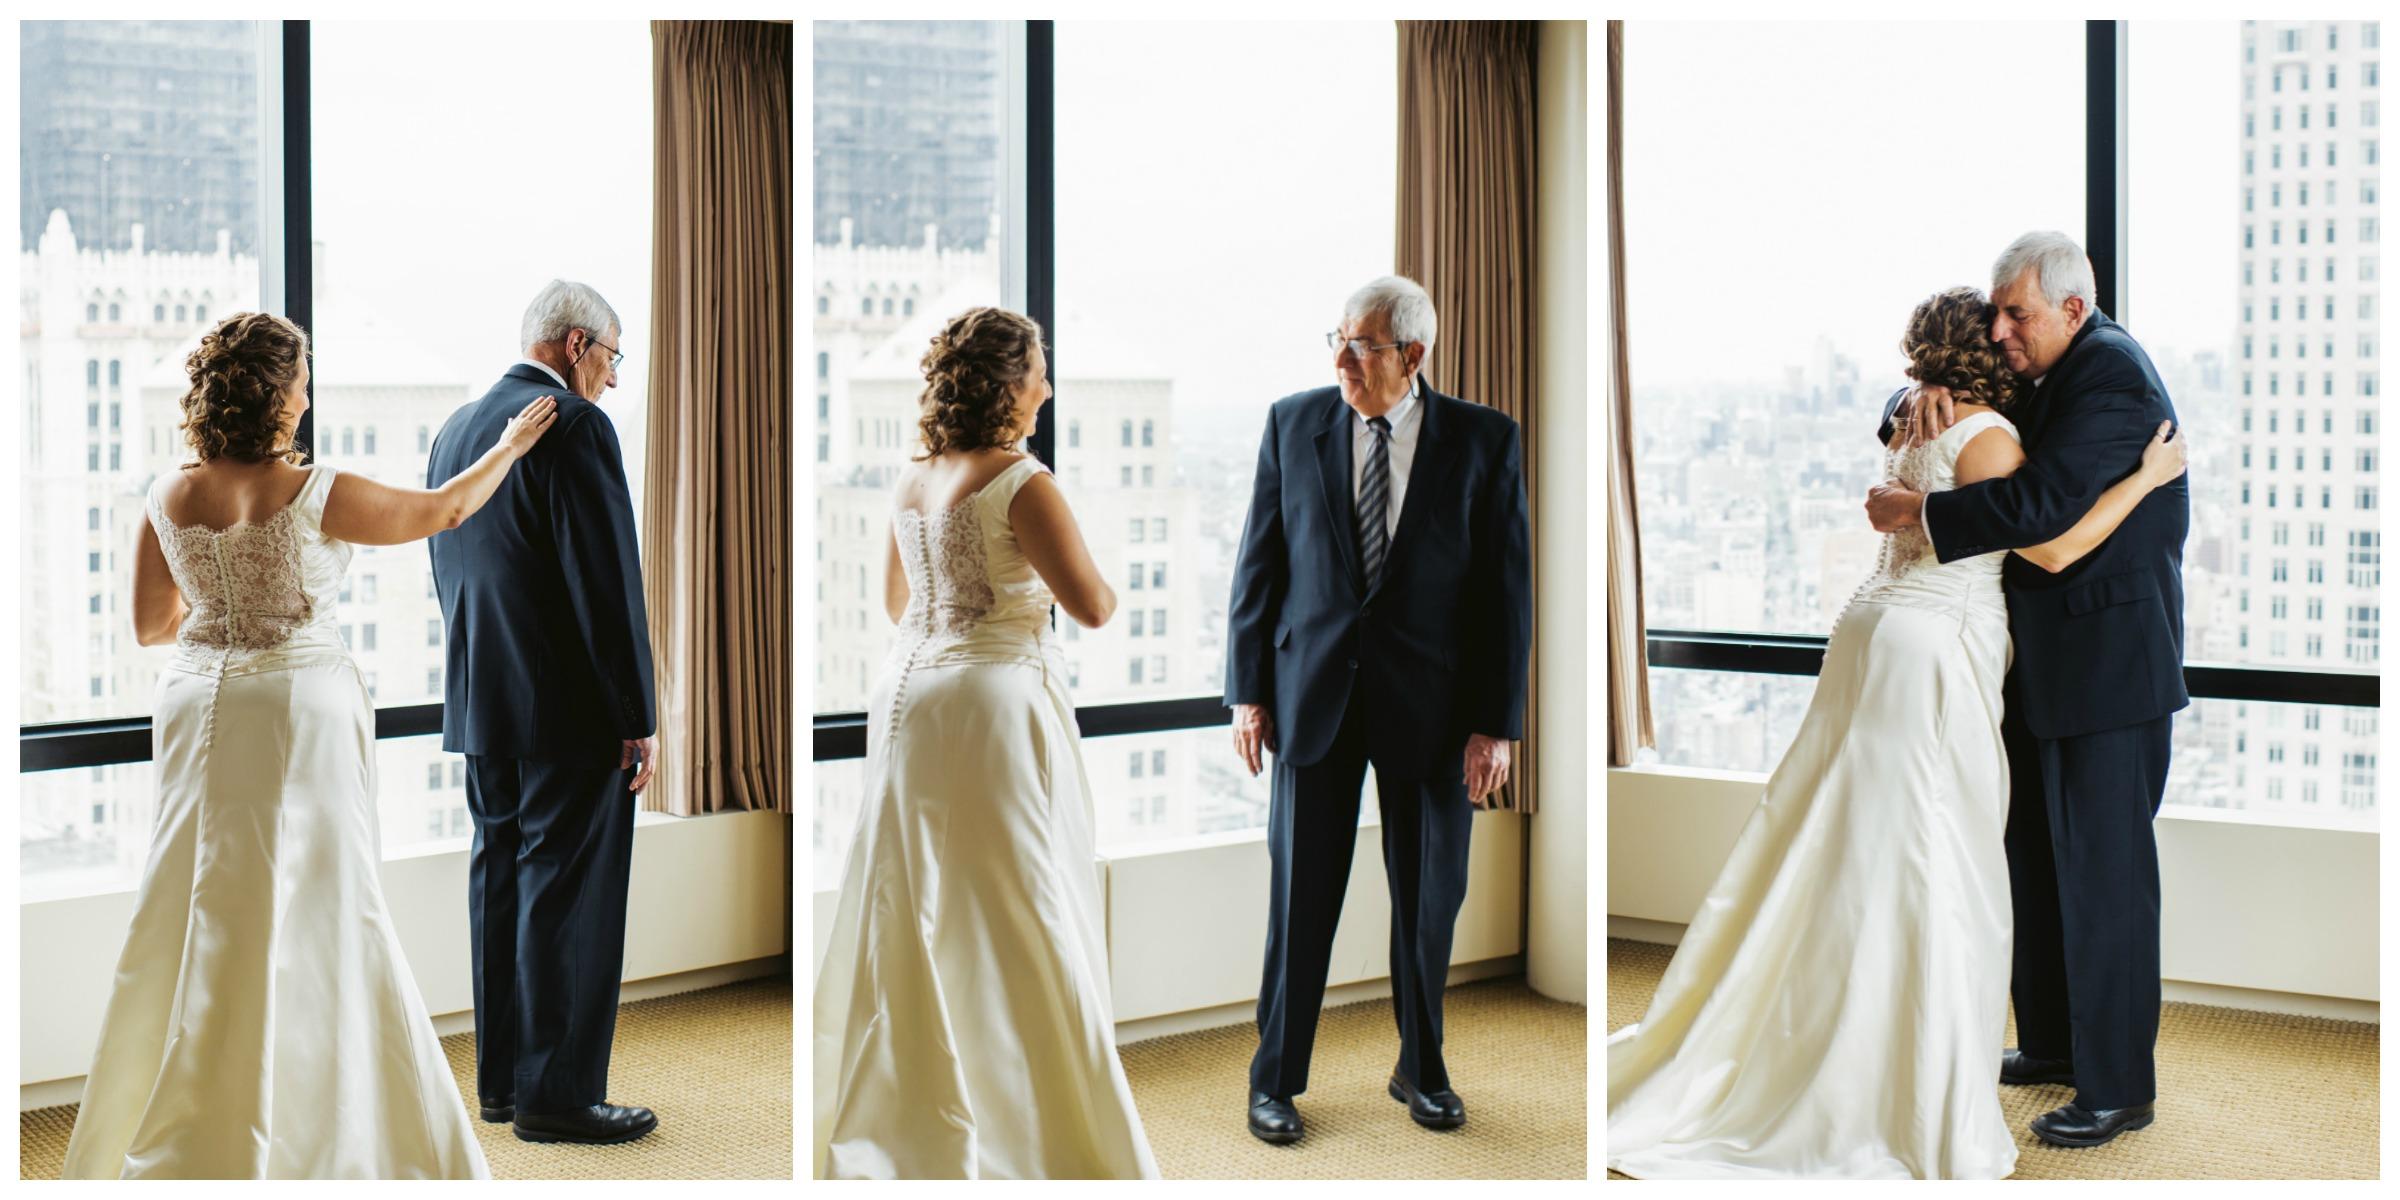 BATTERY PARK GARDENS WEDDING - NYC INTIMATE WEDDING PHOTOGRAPHER - CHI-CHI ARI 5.jpg